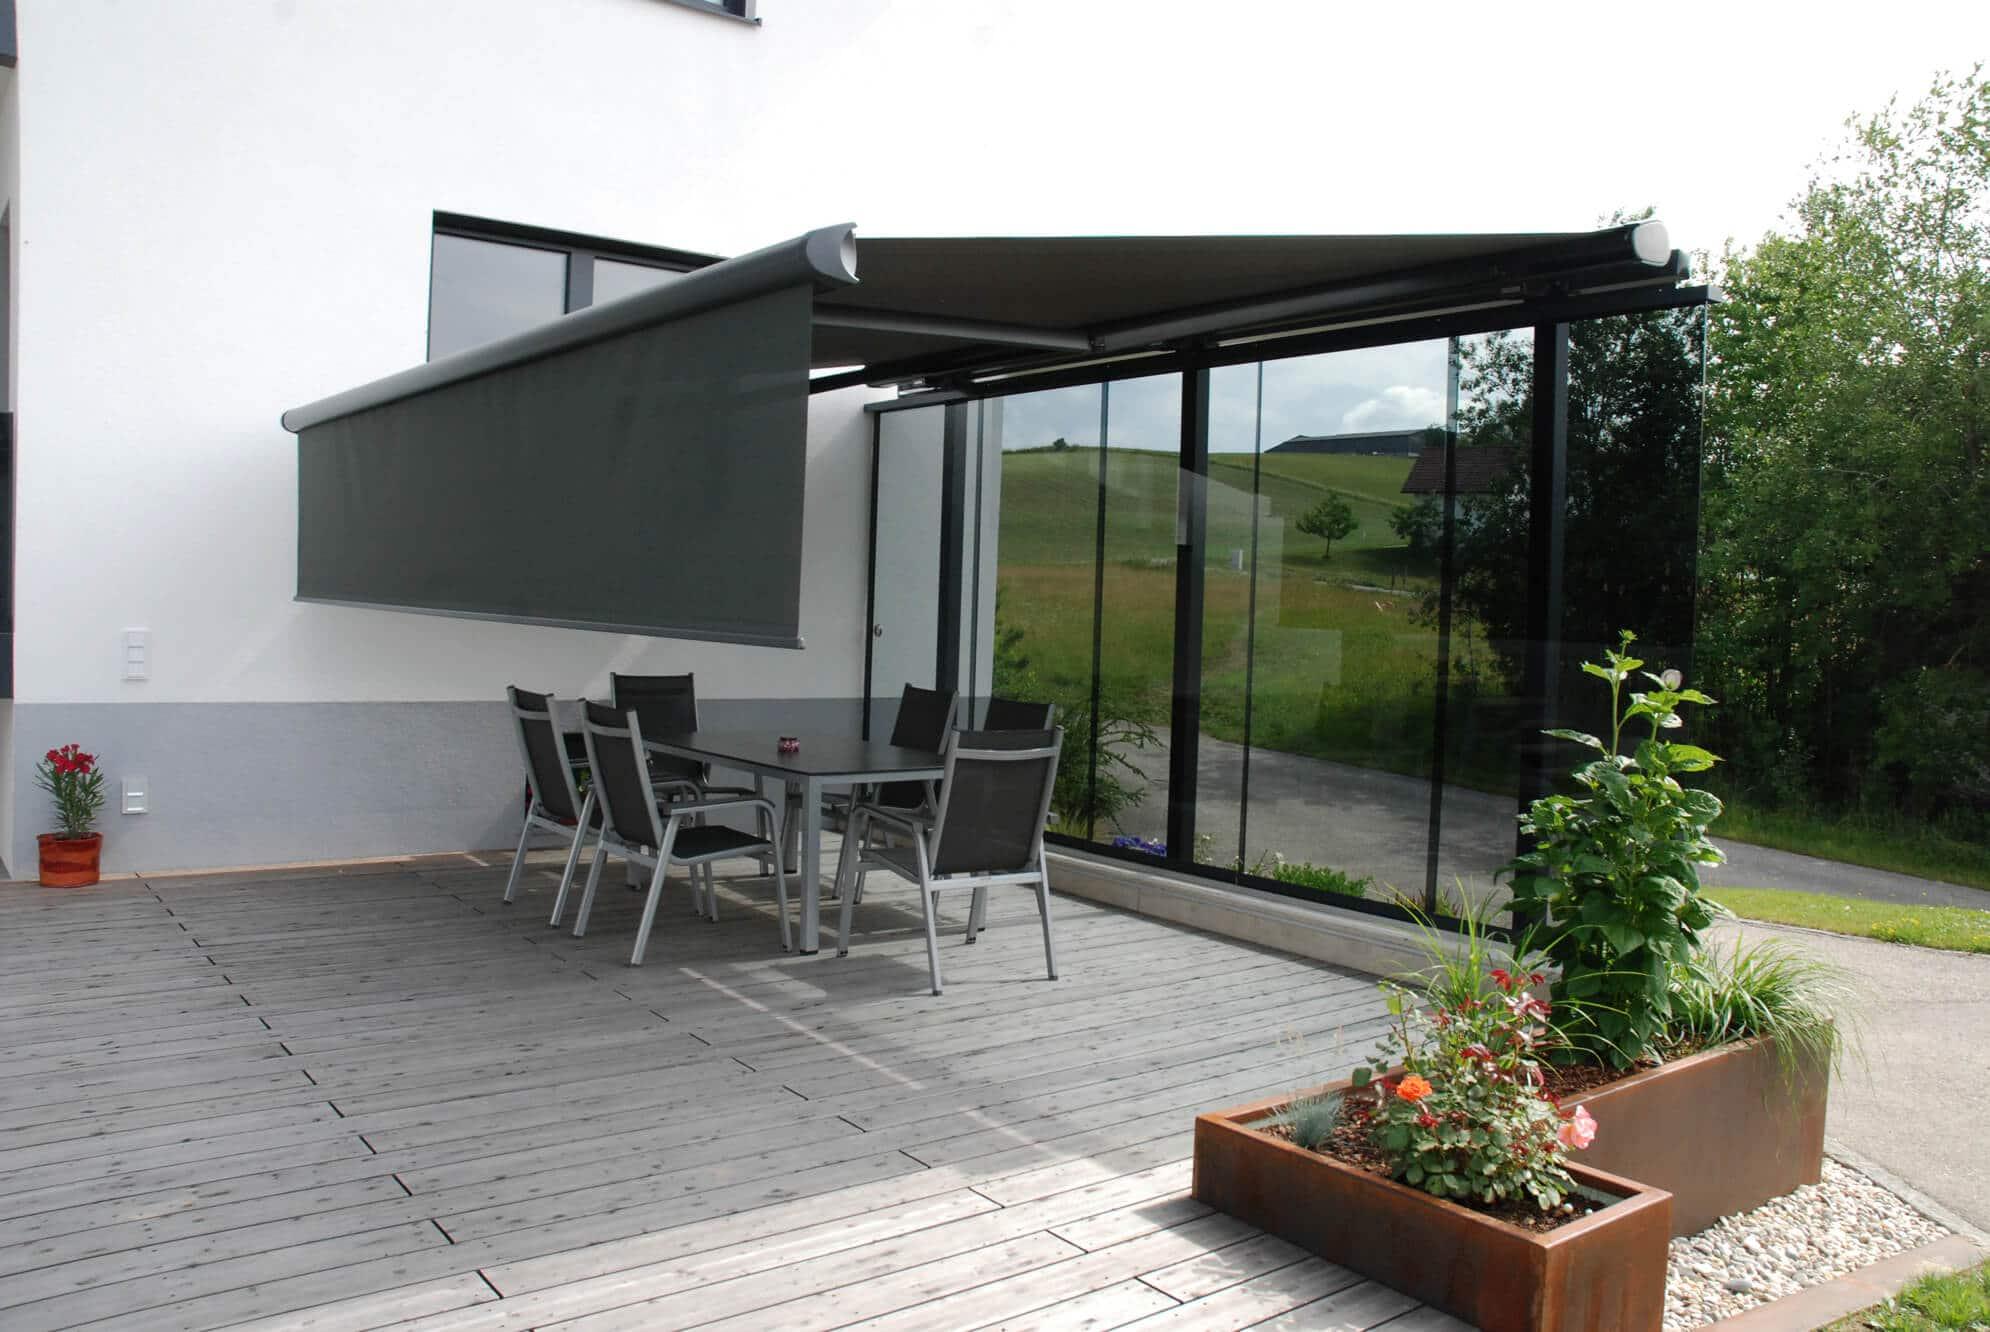 terrassen windschutz garten terrasse bauen windschutz garten holz terrassen windschutz holz. Black Bedroom Furniture Sets. Home Design Ideas